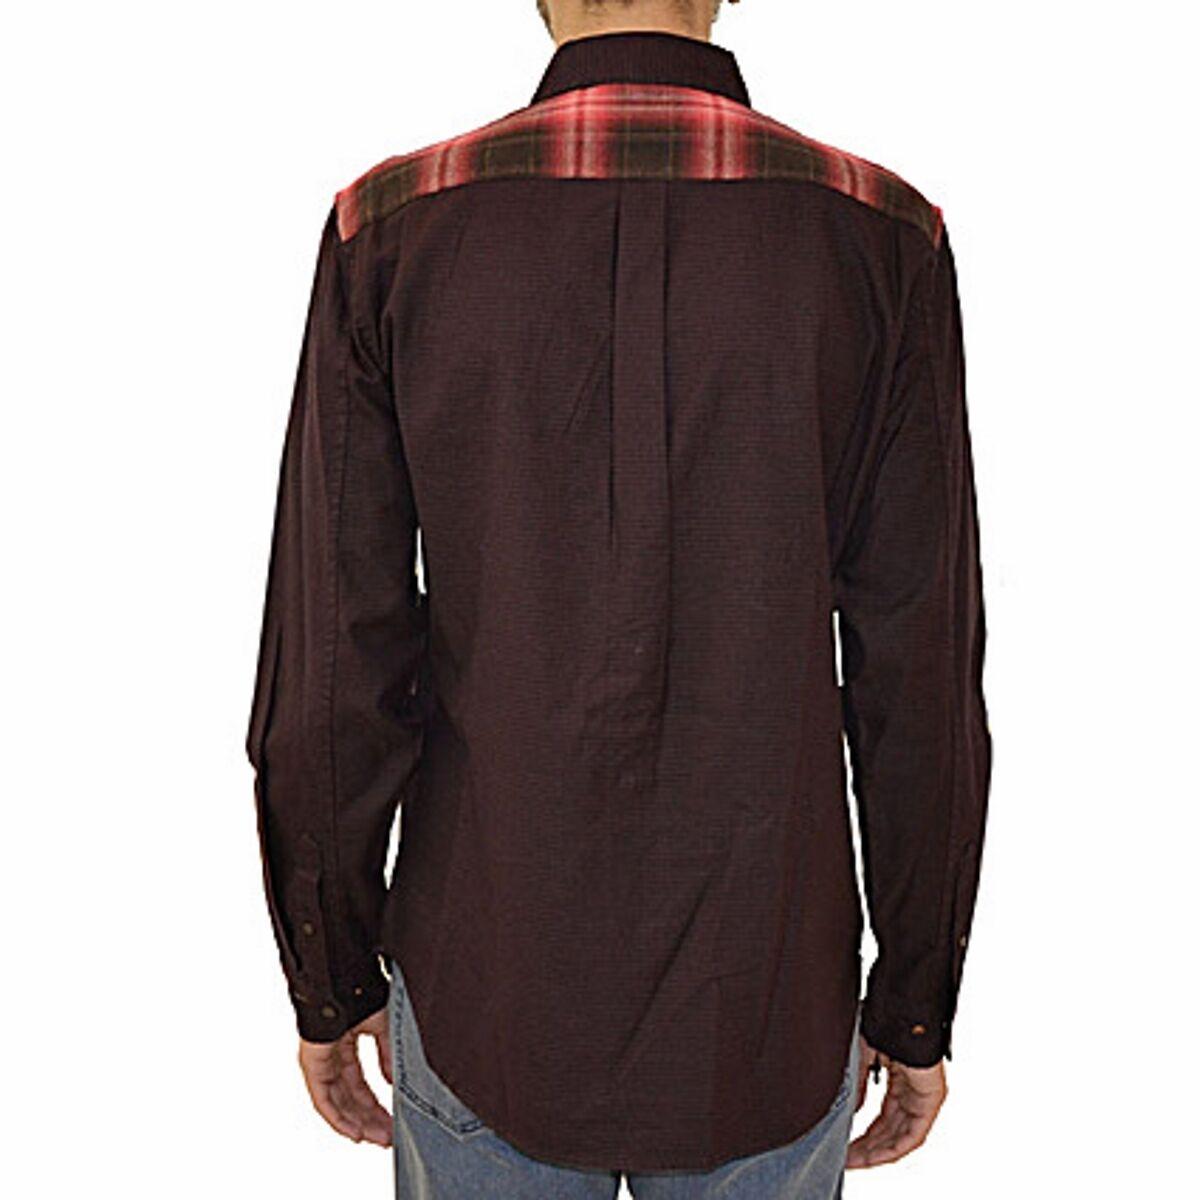 Marc by Marc Jacobs camicia, camicia, camicia, yosemite shirt cdcbe7